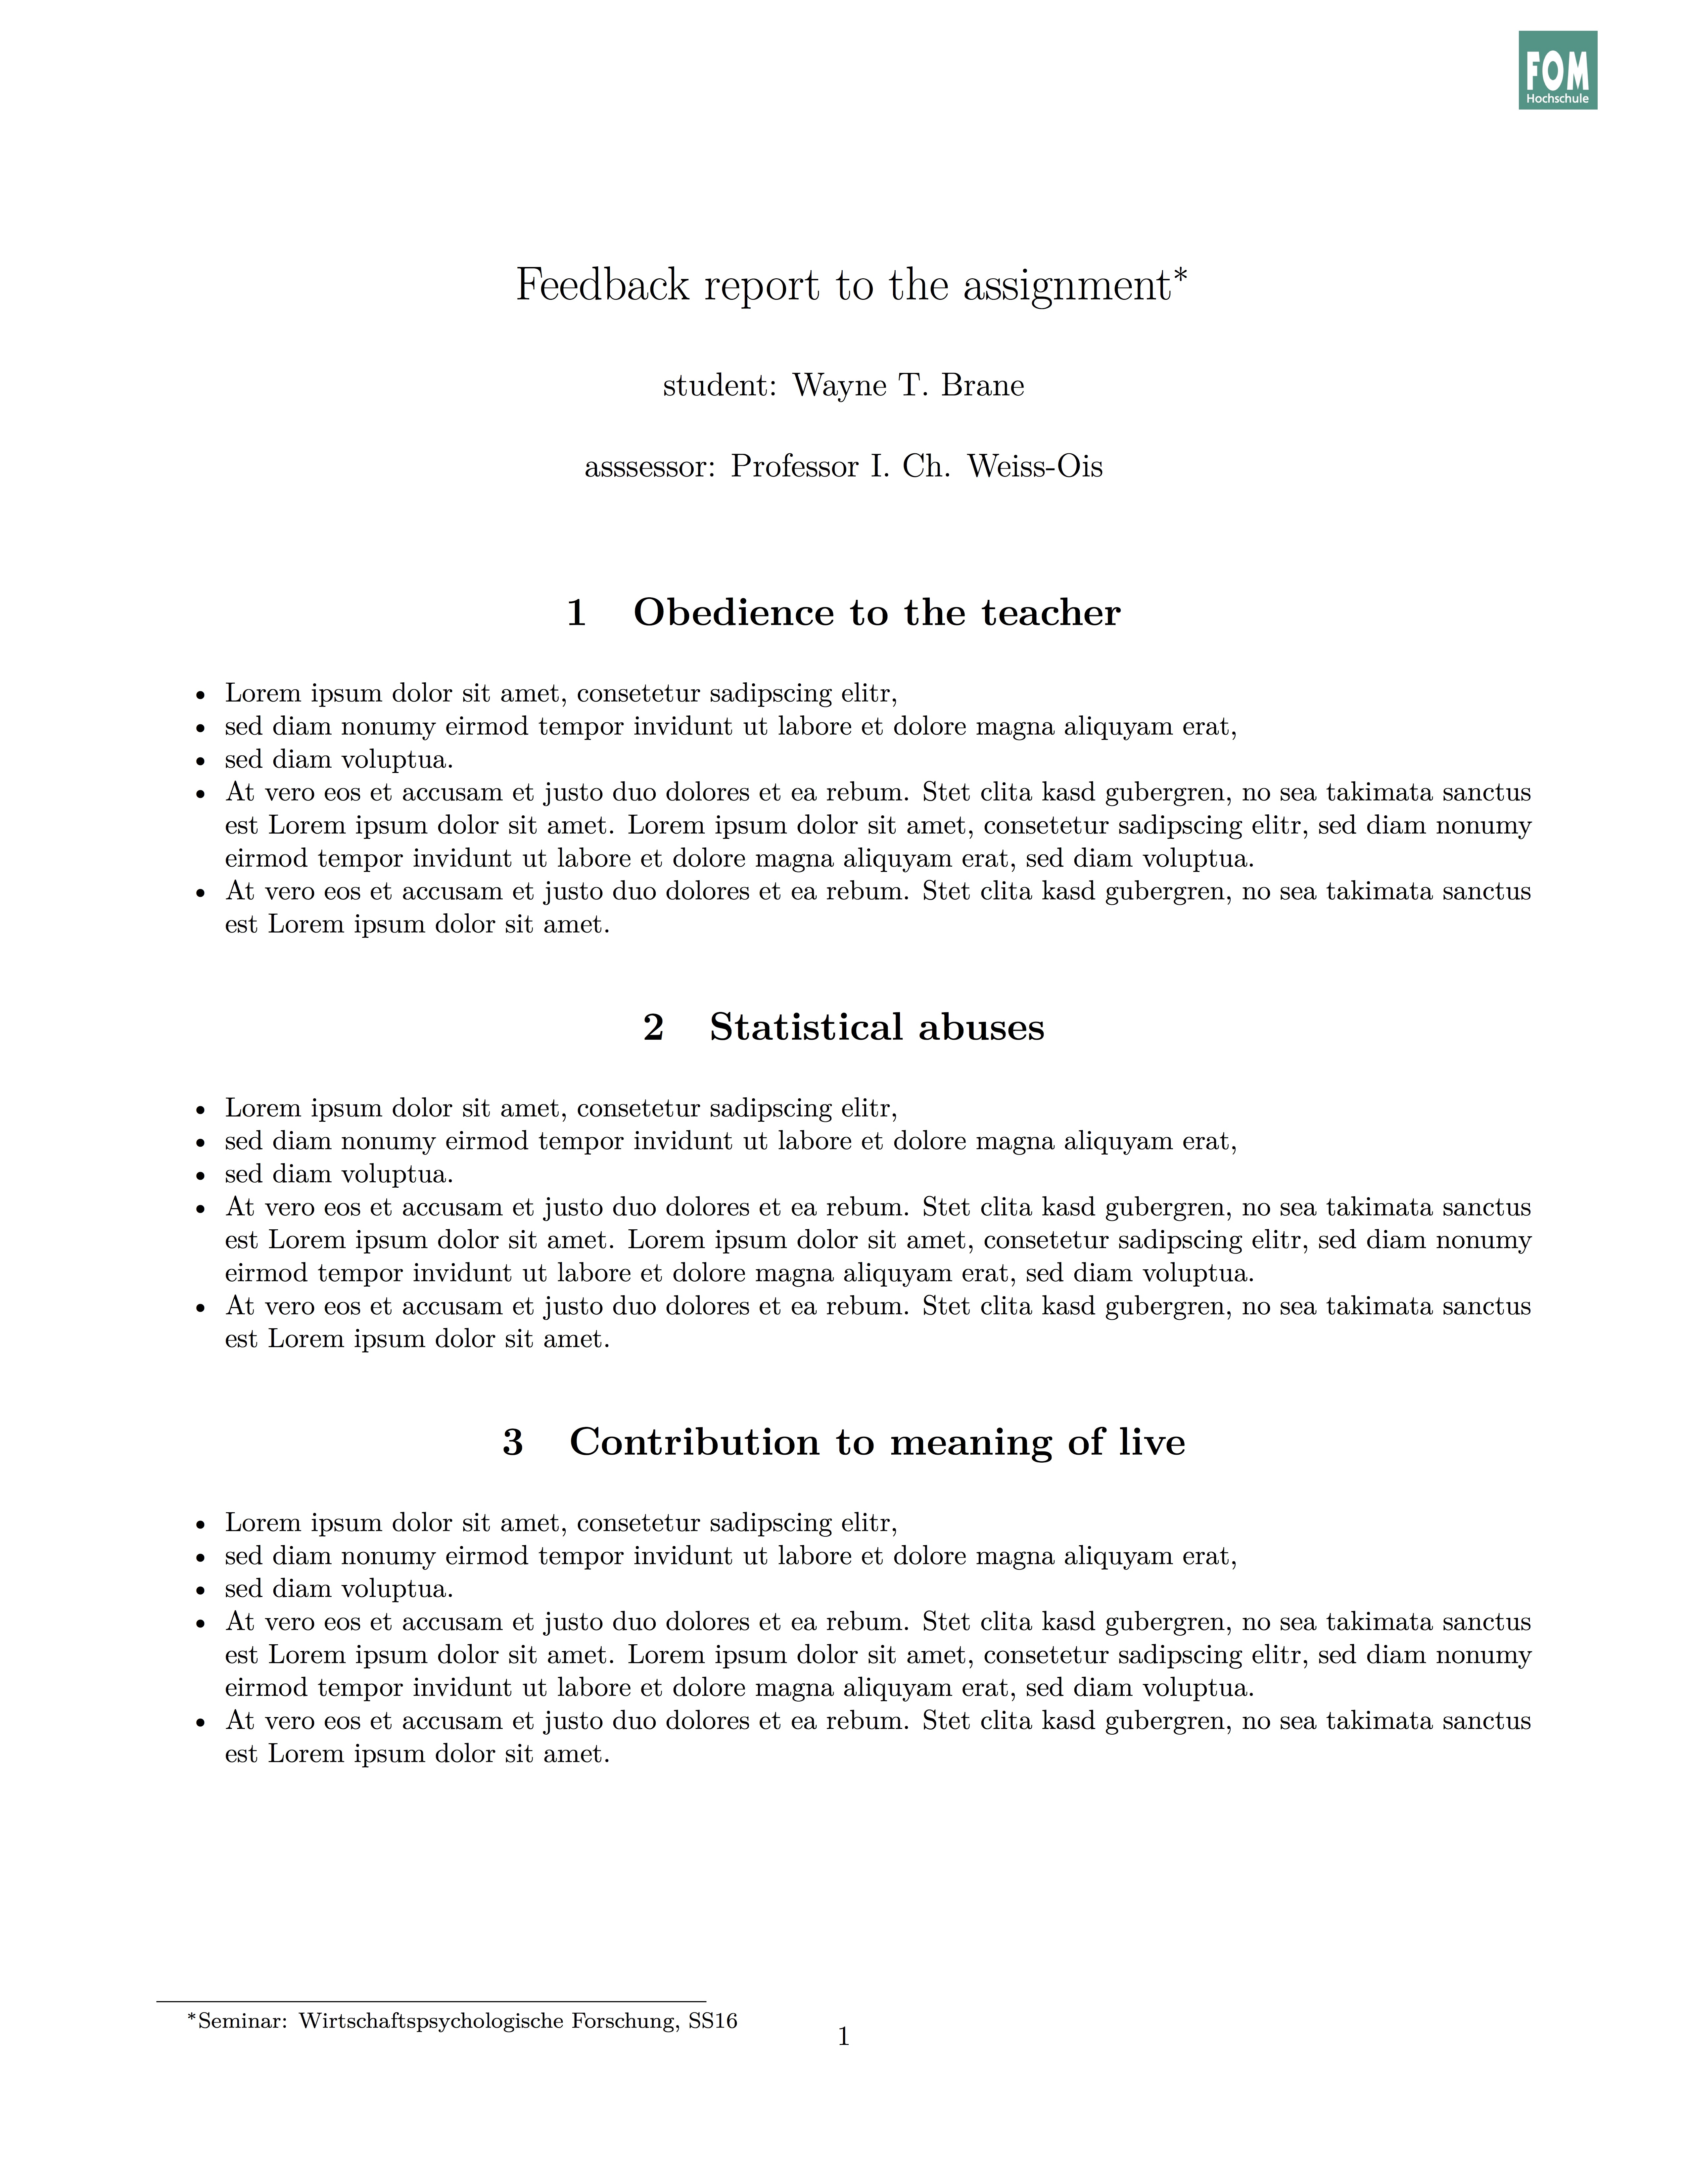 rmarkdown convert latex document to rmarkdown